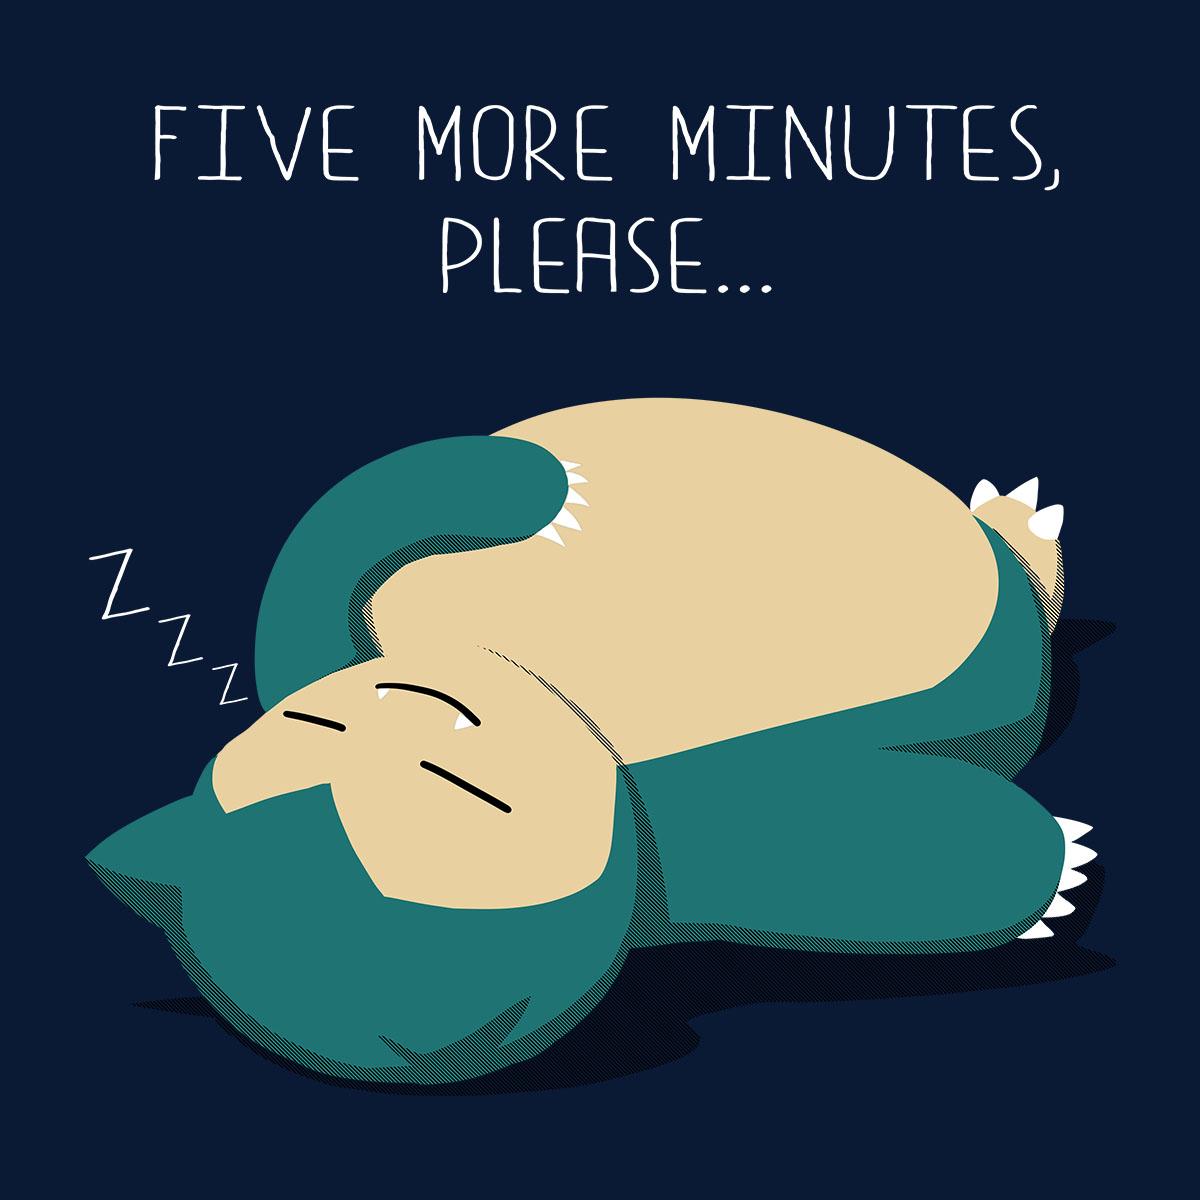 Pokemon-Snorlax-Five-More-Minutes-Please-Men-039-s-T-Shirt thumbnail 5